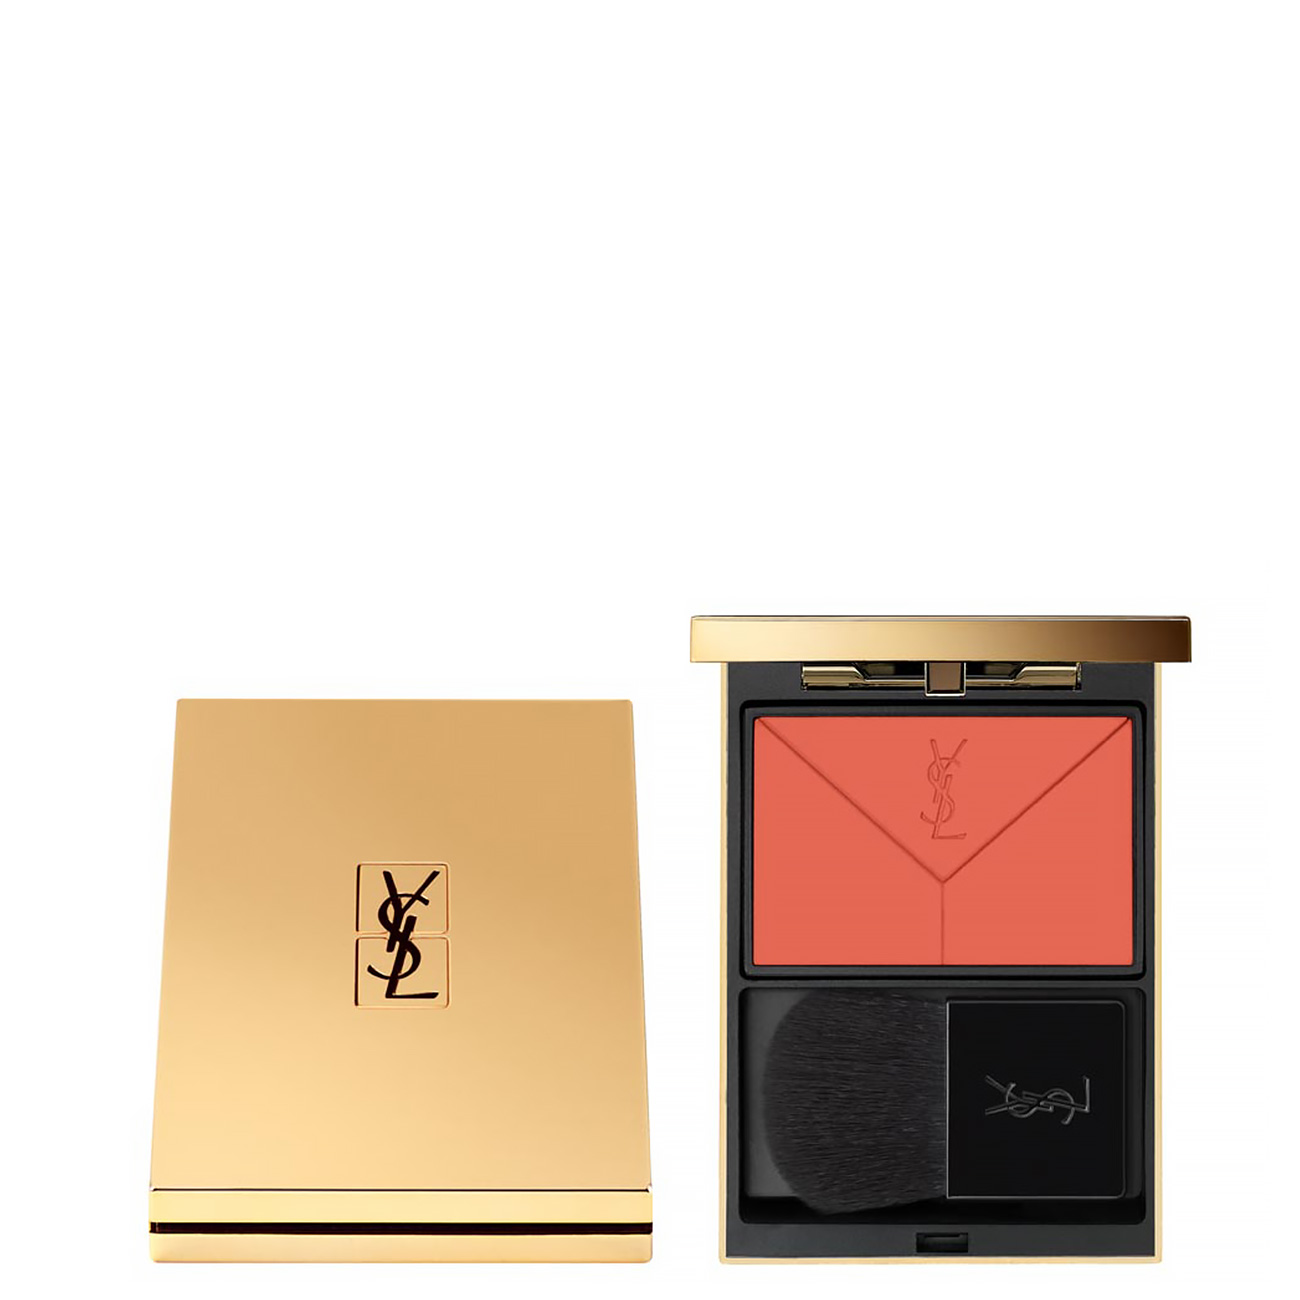 Couture Blush 3 3gr Yves Saint Laurent imagine 2021 bestvalue.eu